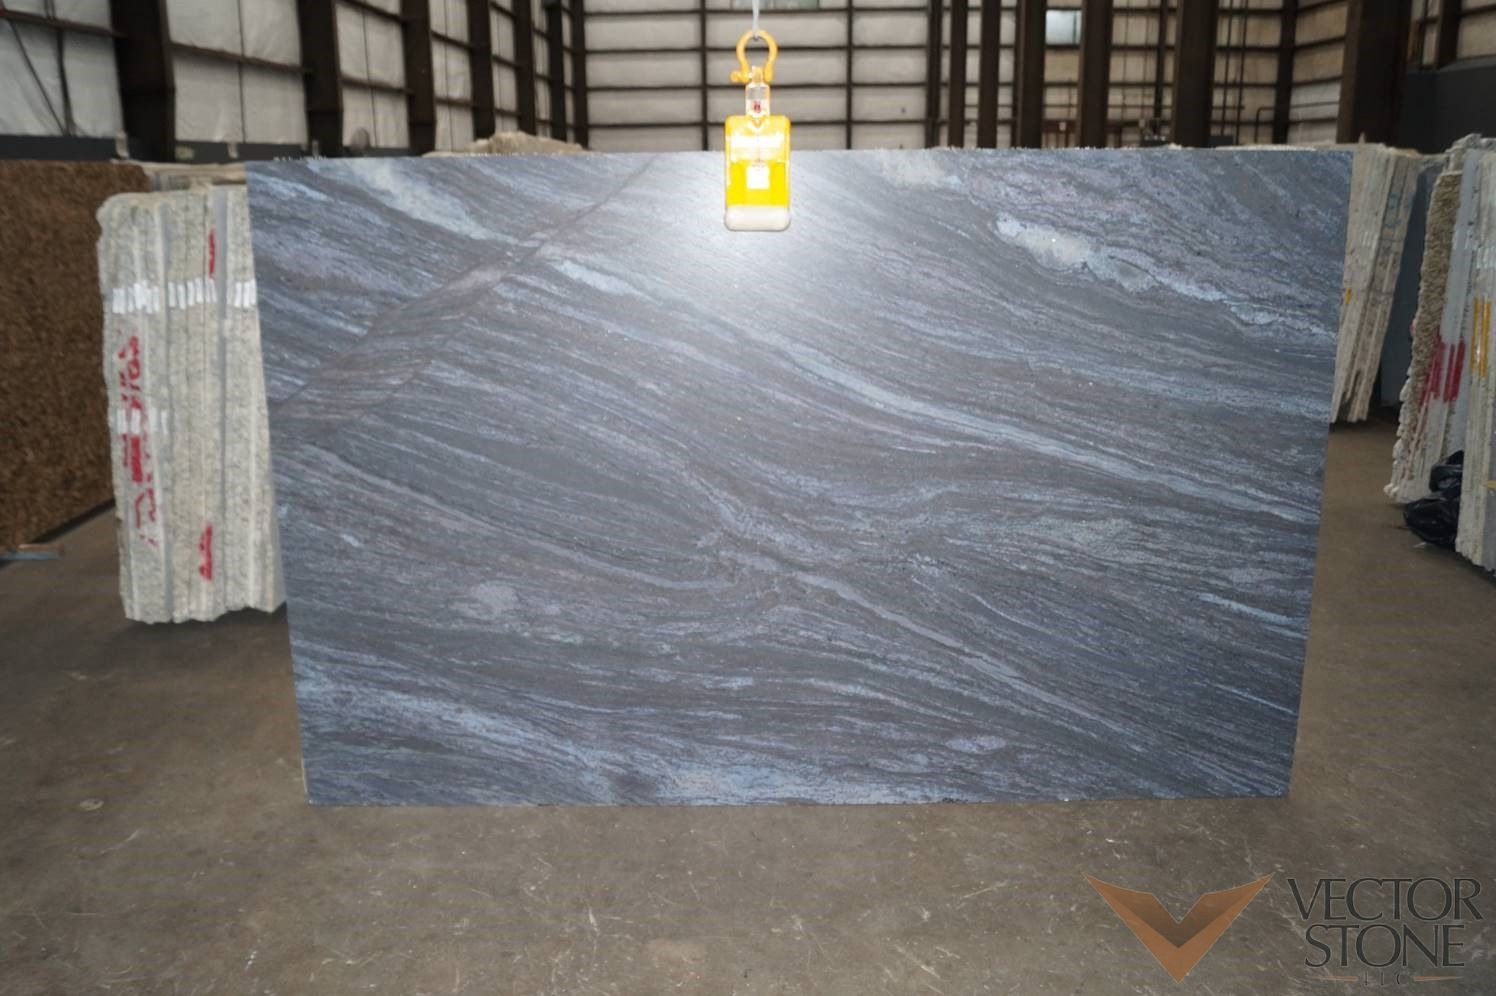 Brass Blue Leather Vector Stone Home Decor Decor Stone